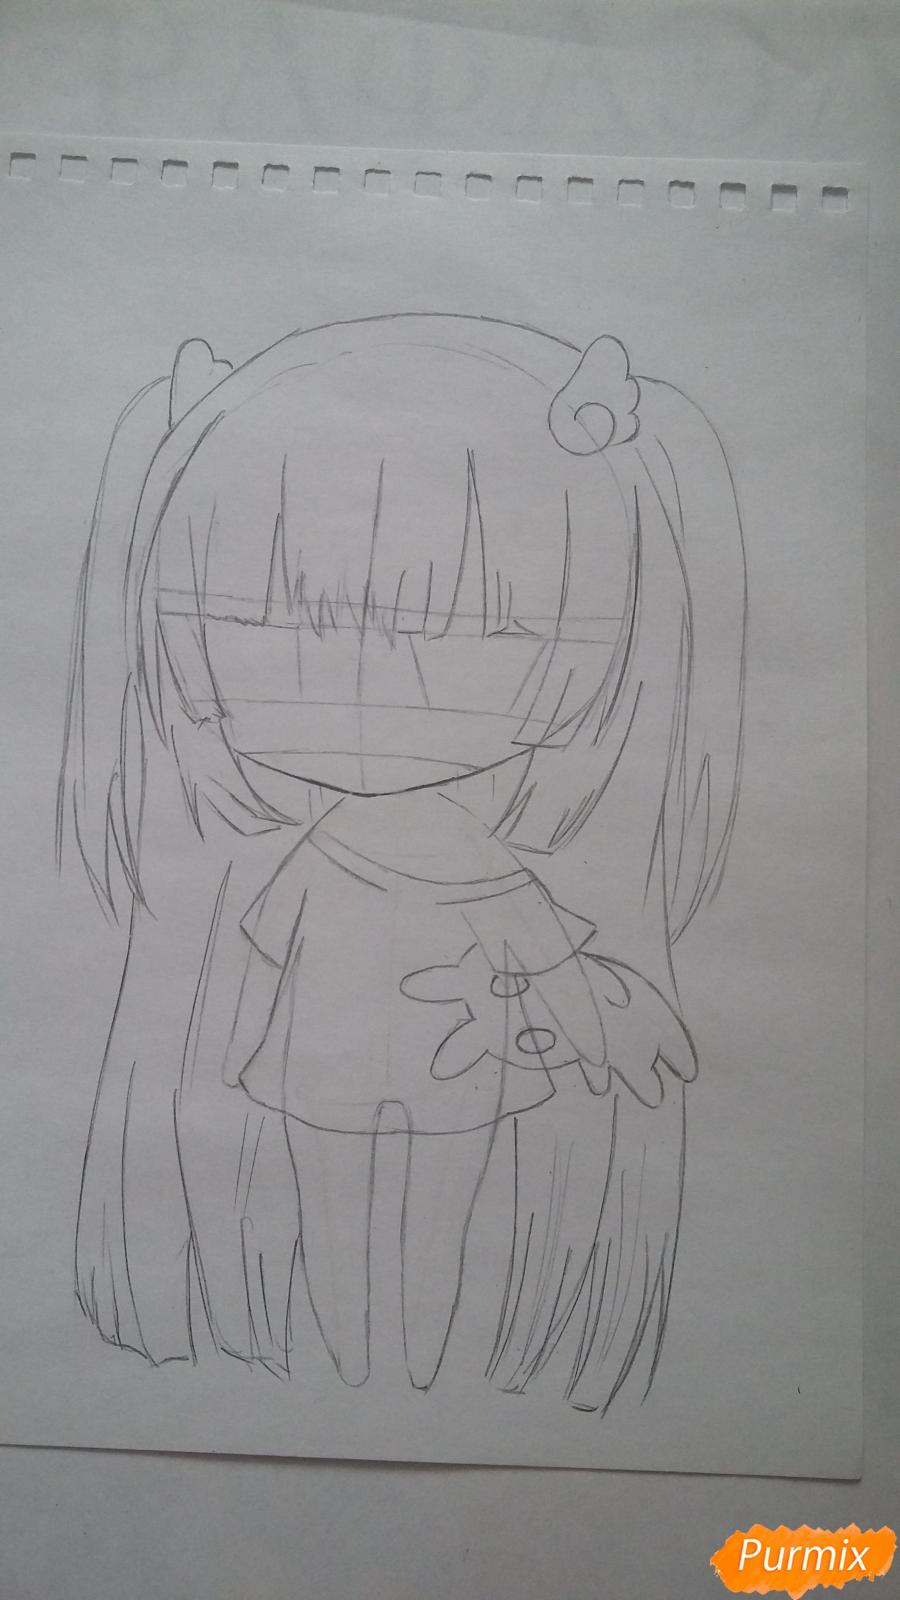 Рисуем милую чиби-тян в пижаме и игрушкой в руке карандашами - шаг 5